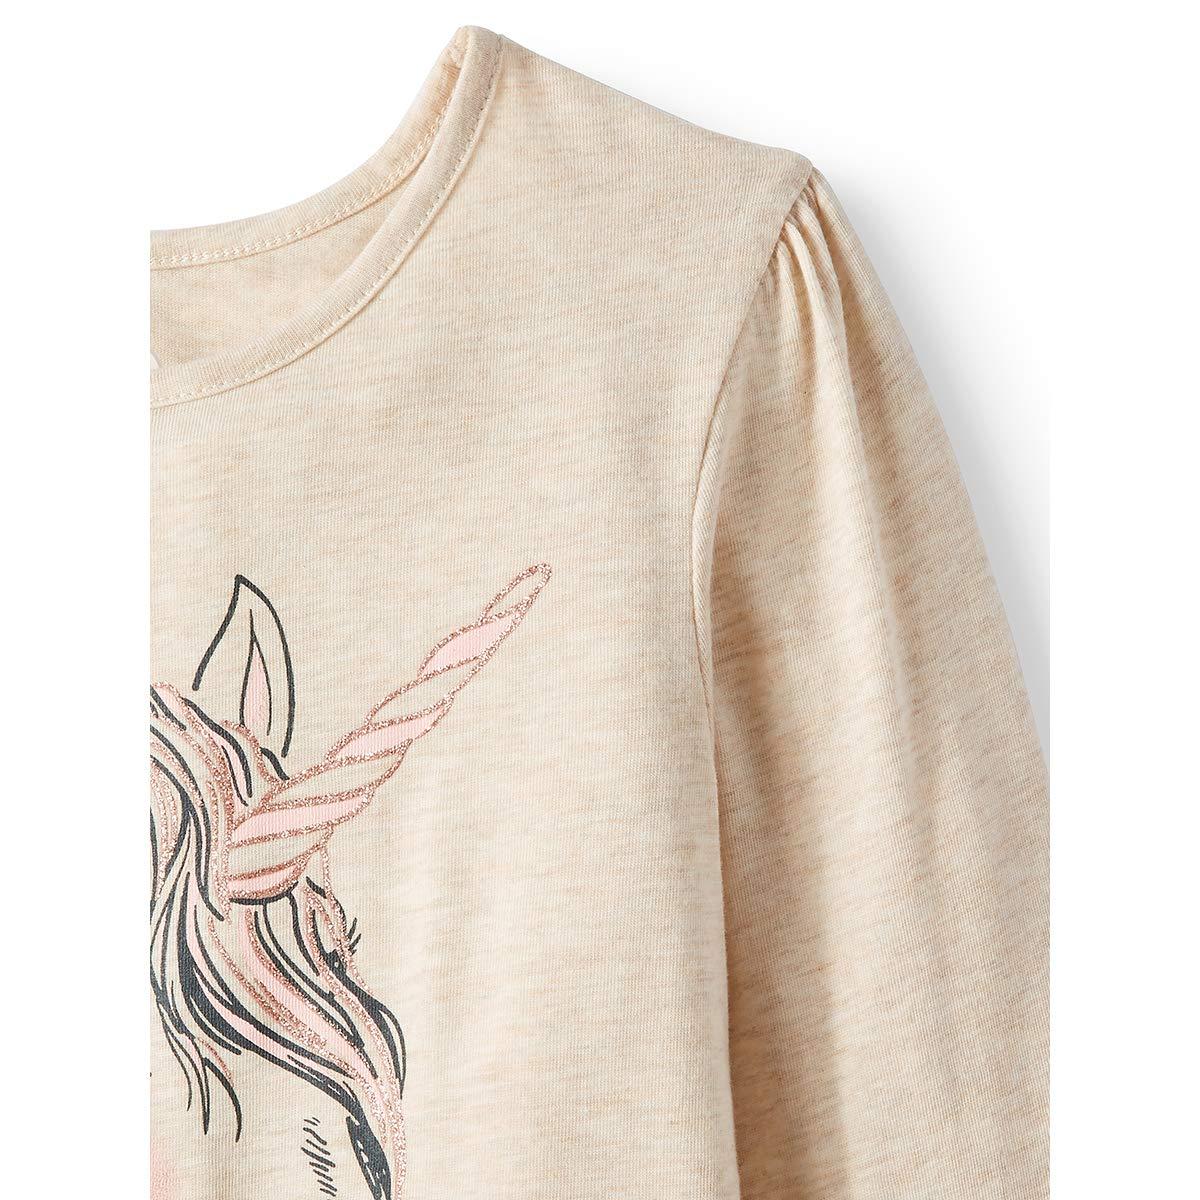 2 Piece Set Unicorn Beautiful Minds Inspire Rainbow Cream Top and Shimmering Pink Leggings Set